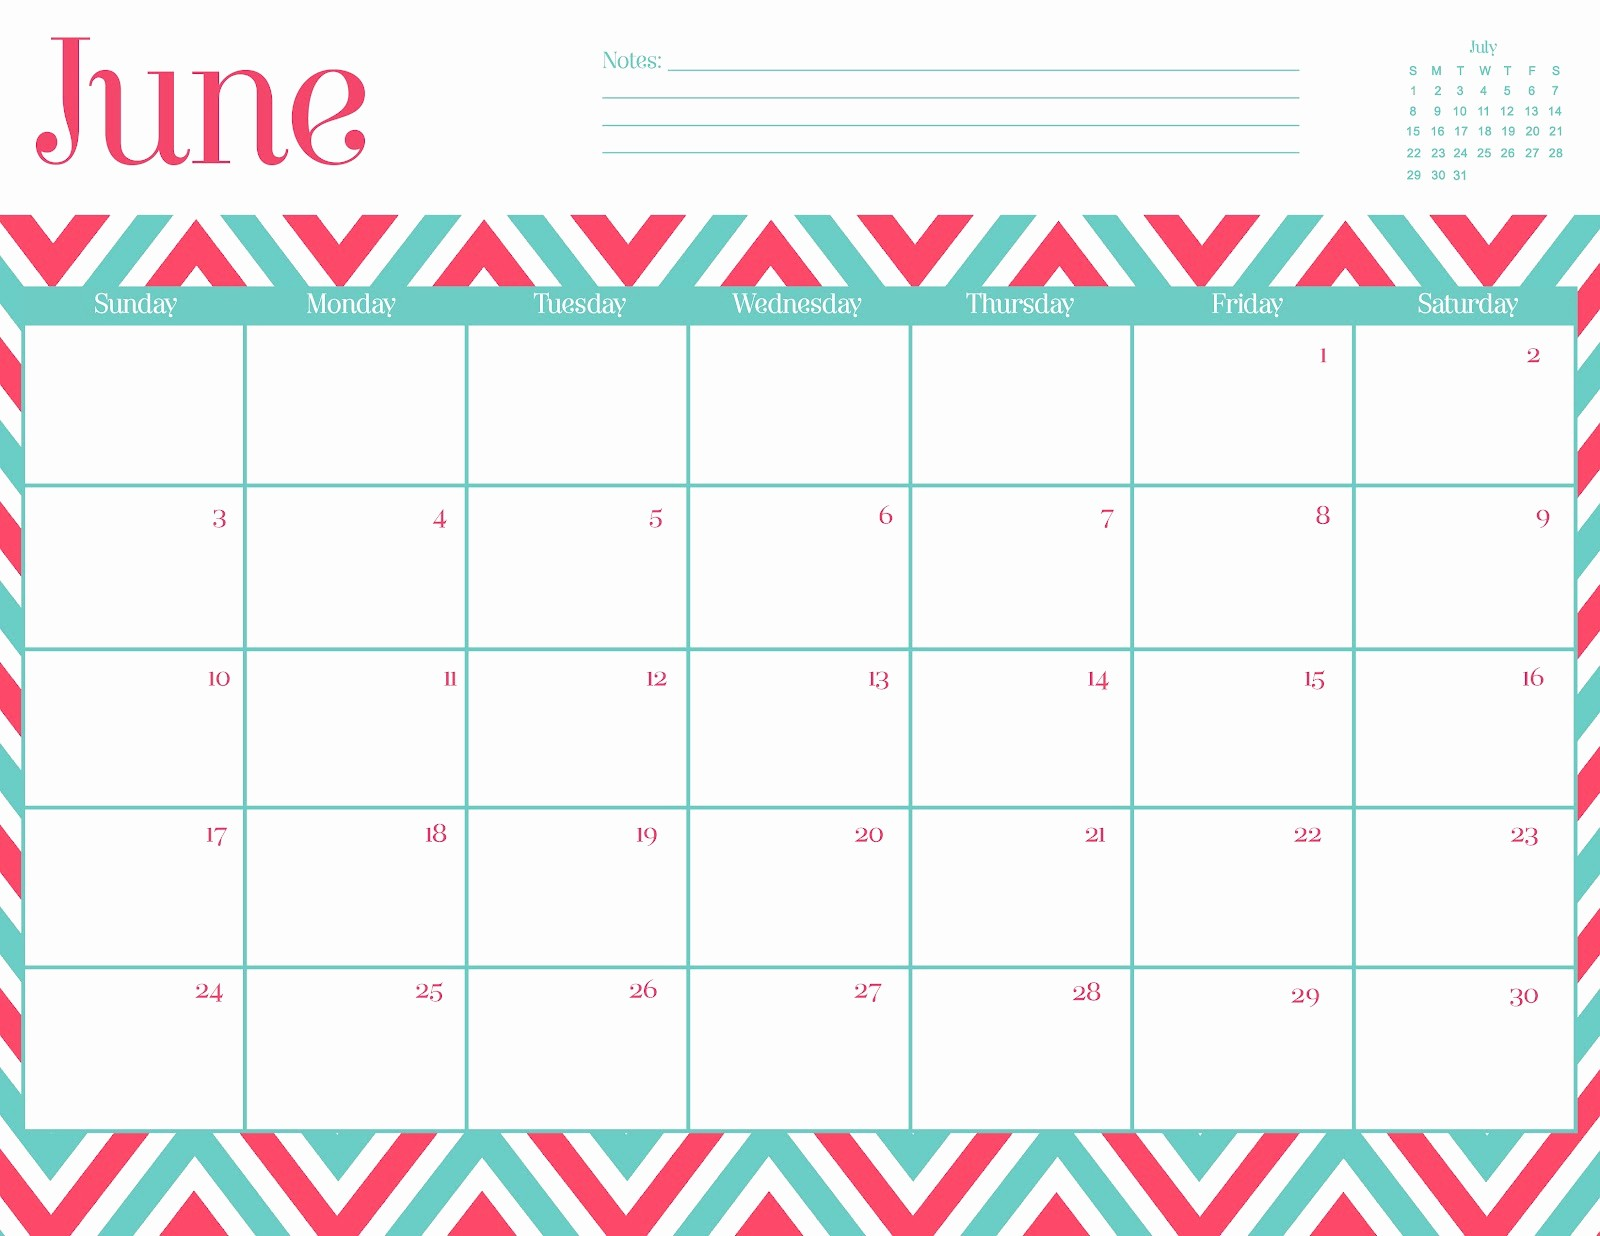 Calendar Template for June 2015 Fresh 8 Best Of Cute Printable Calendars June 2015 Cute